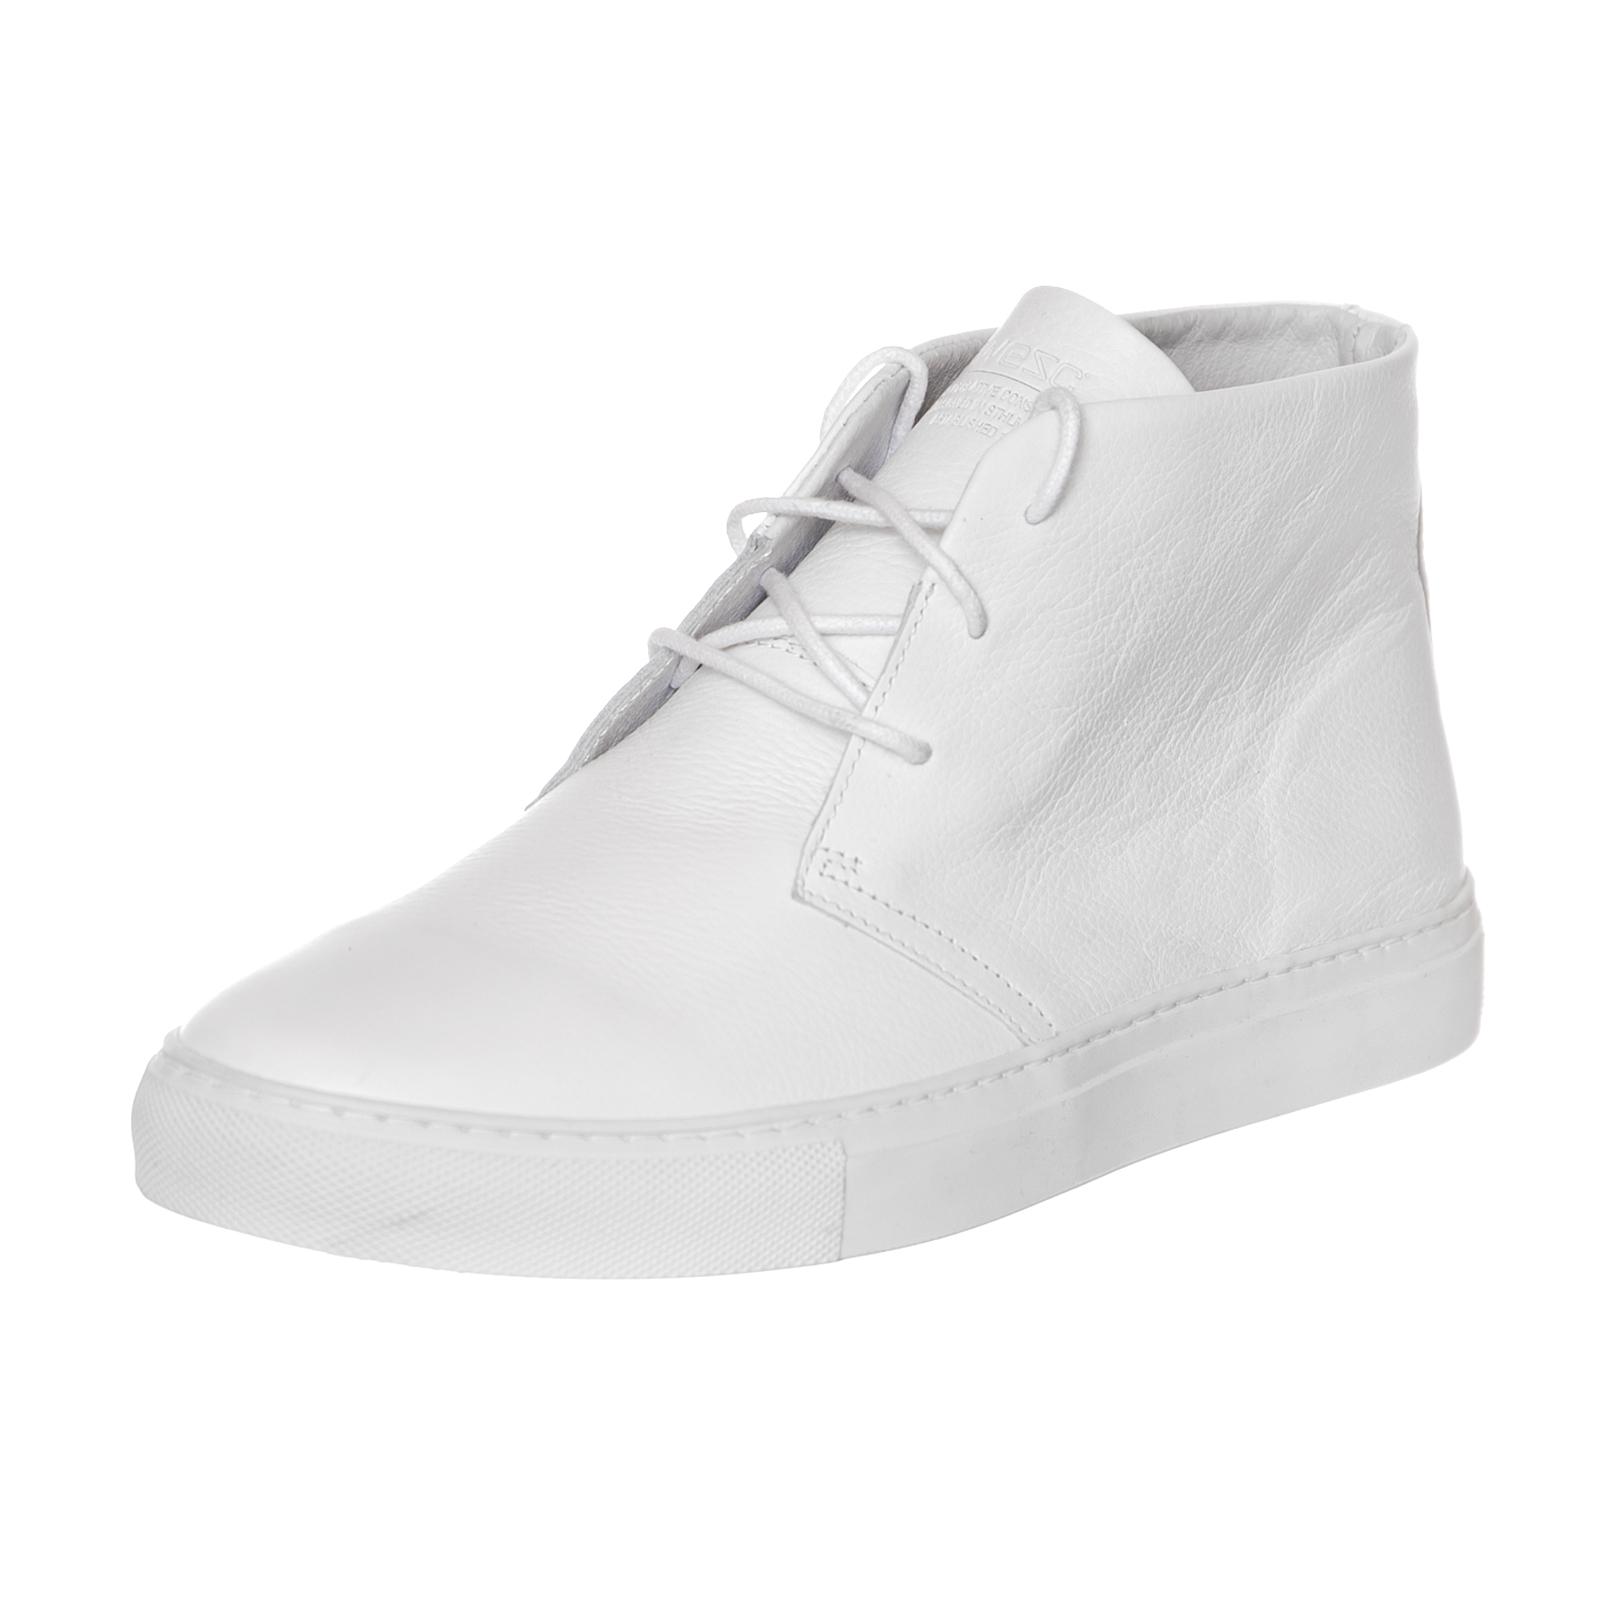 37d7407471 Wesc Sneakers Casual Chukka Mid Top White White